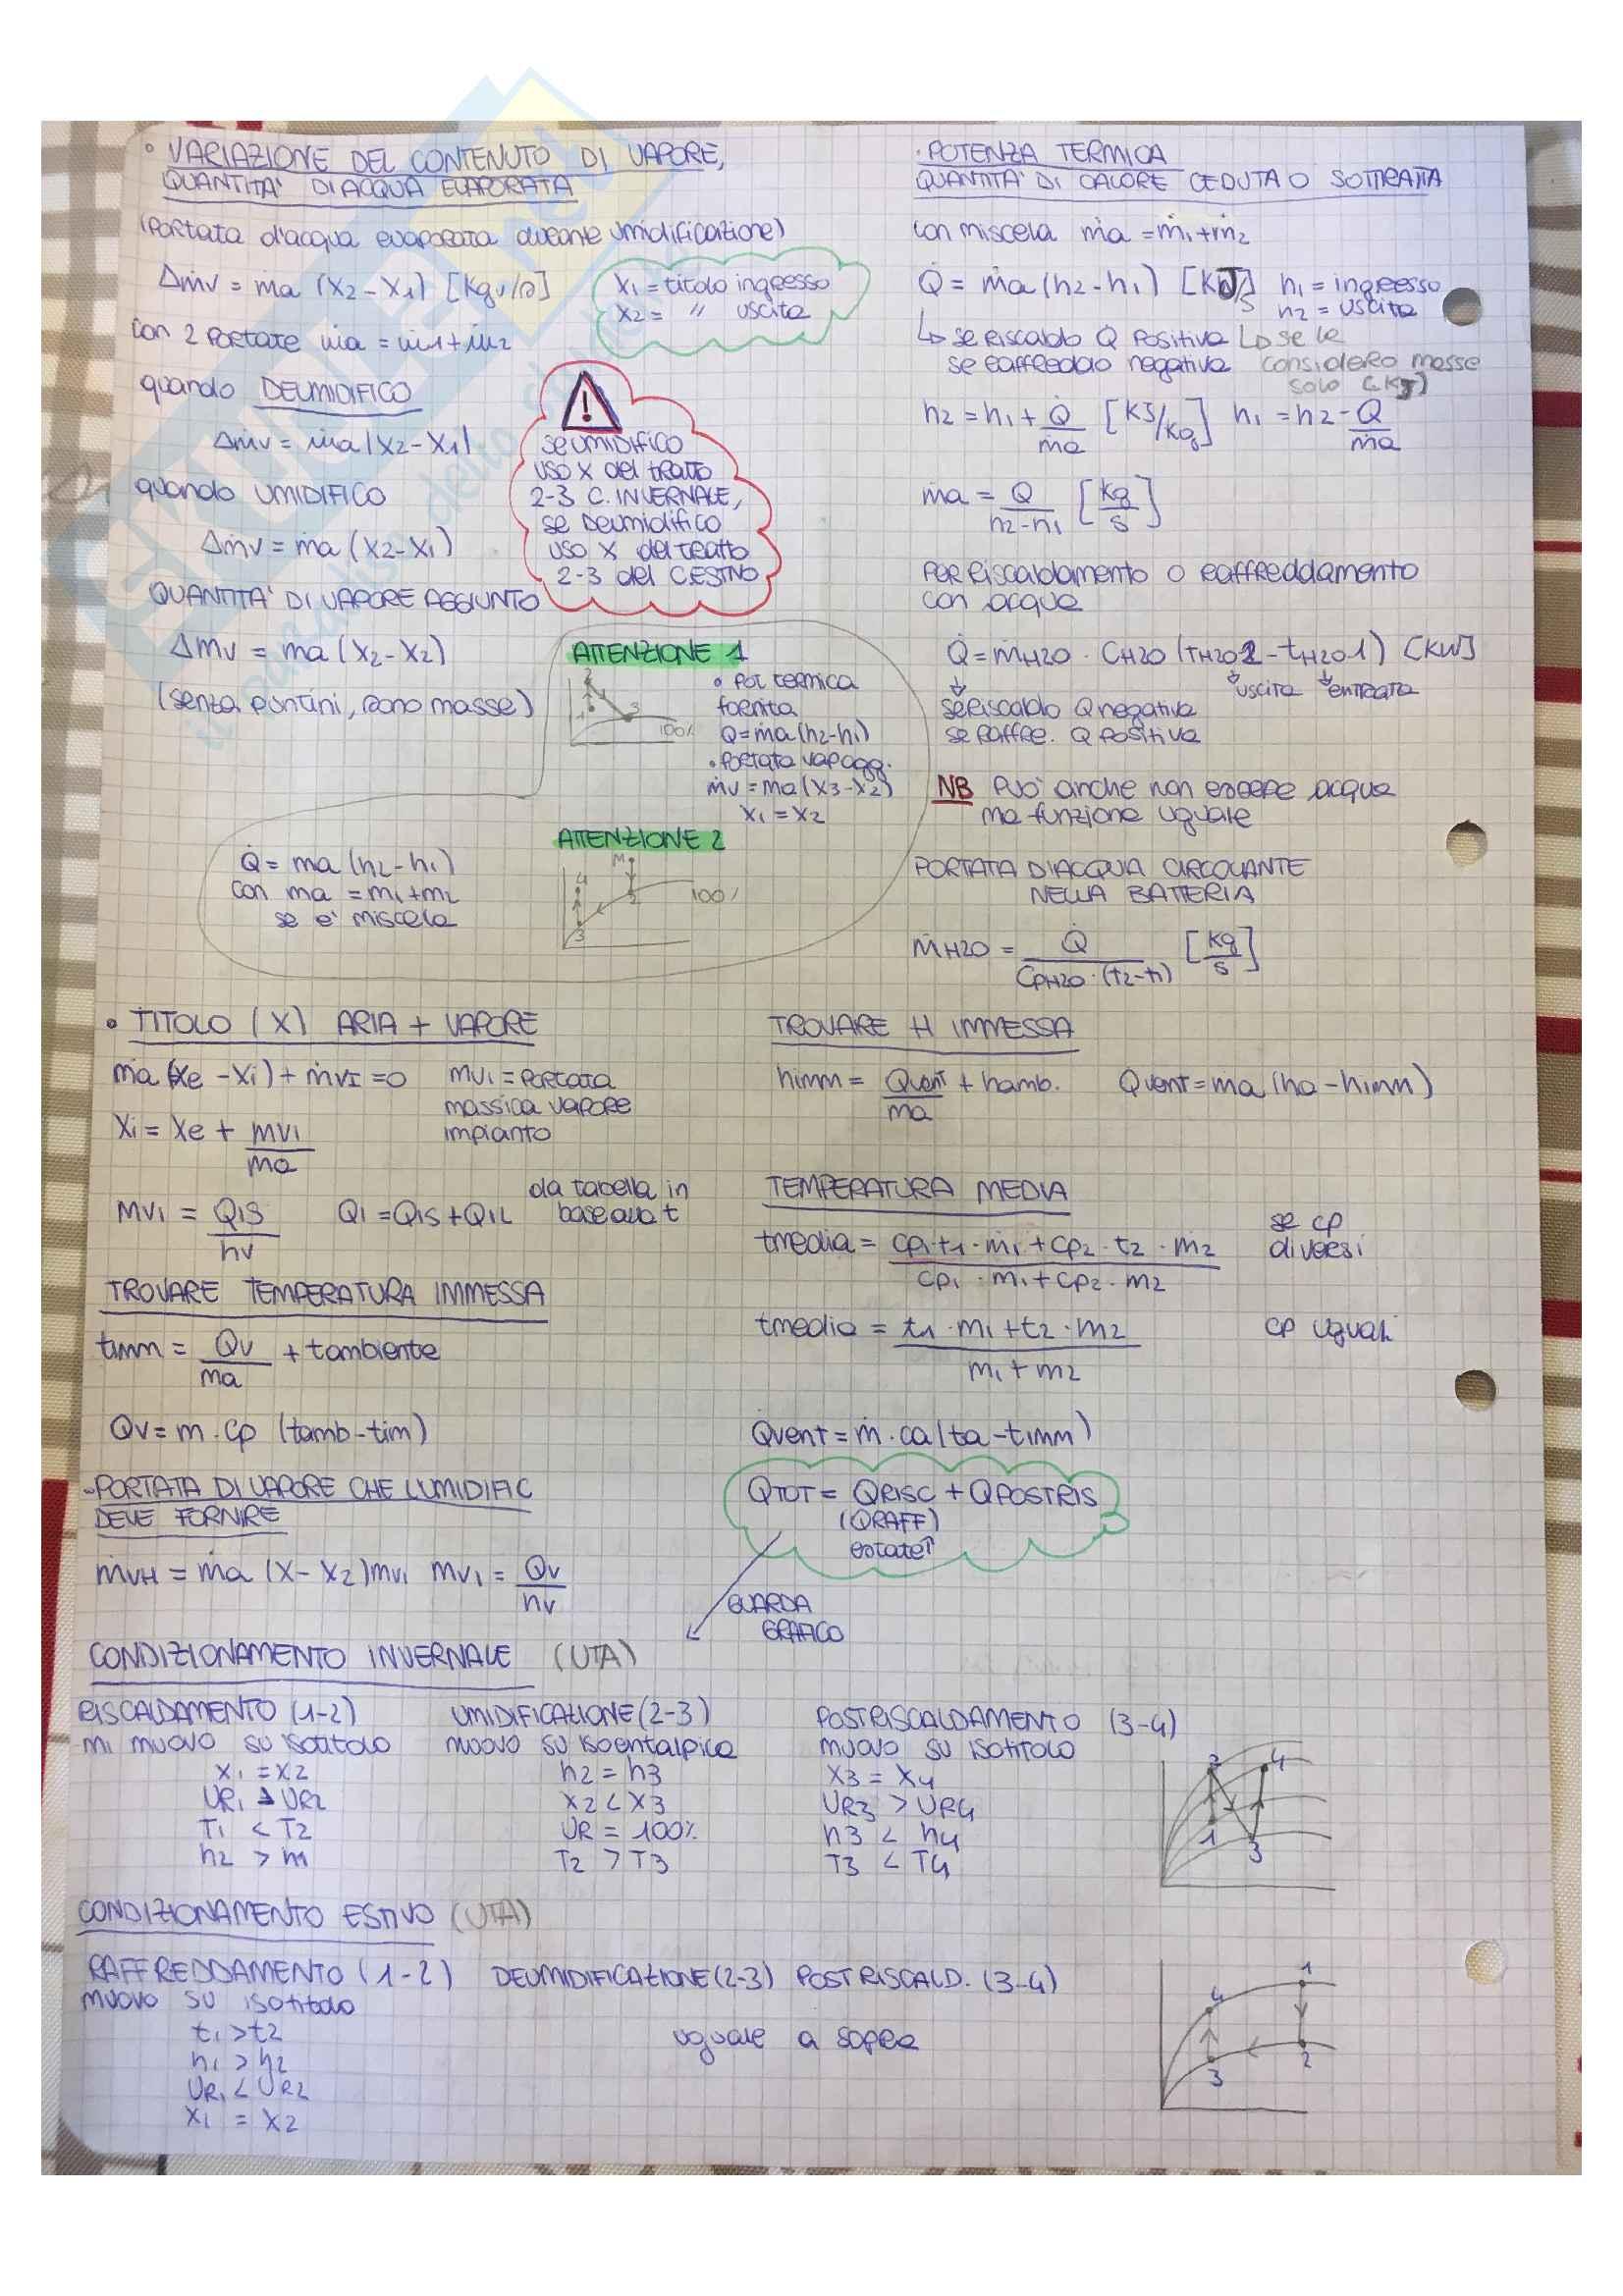 Formulario fisica tecnica pt 1 Pag. 6